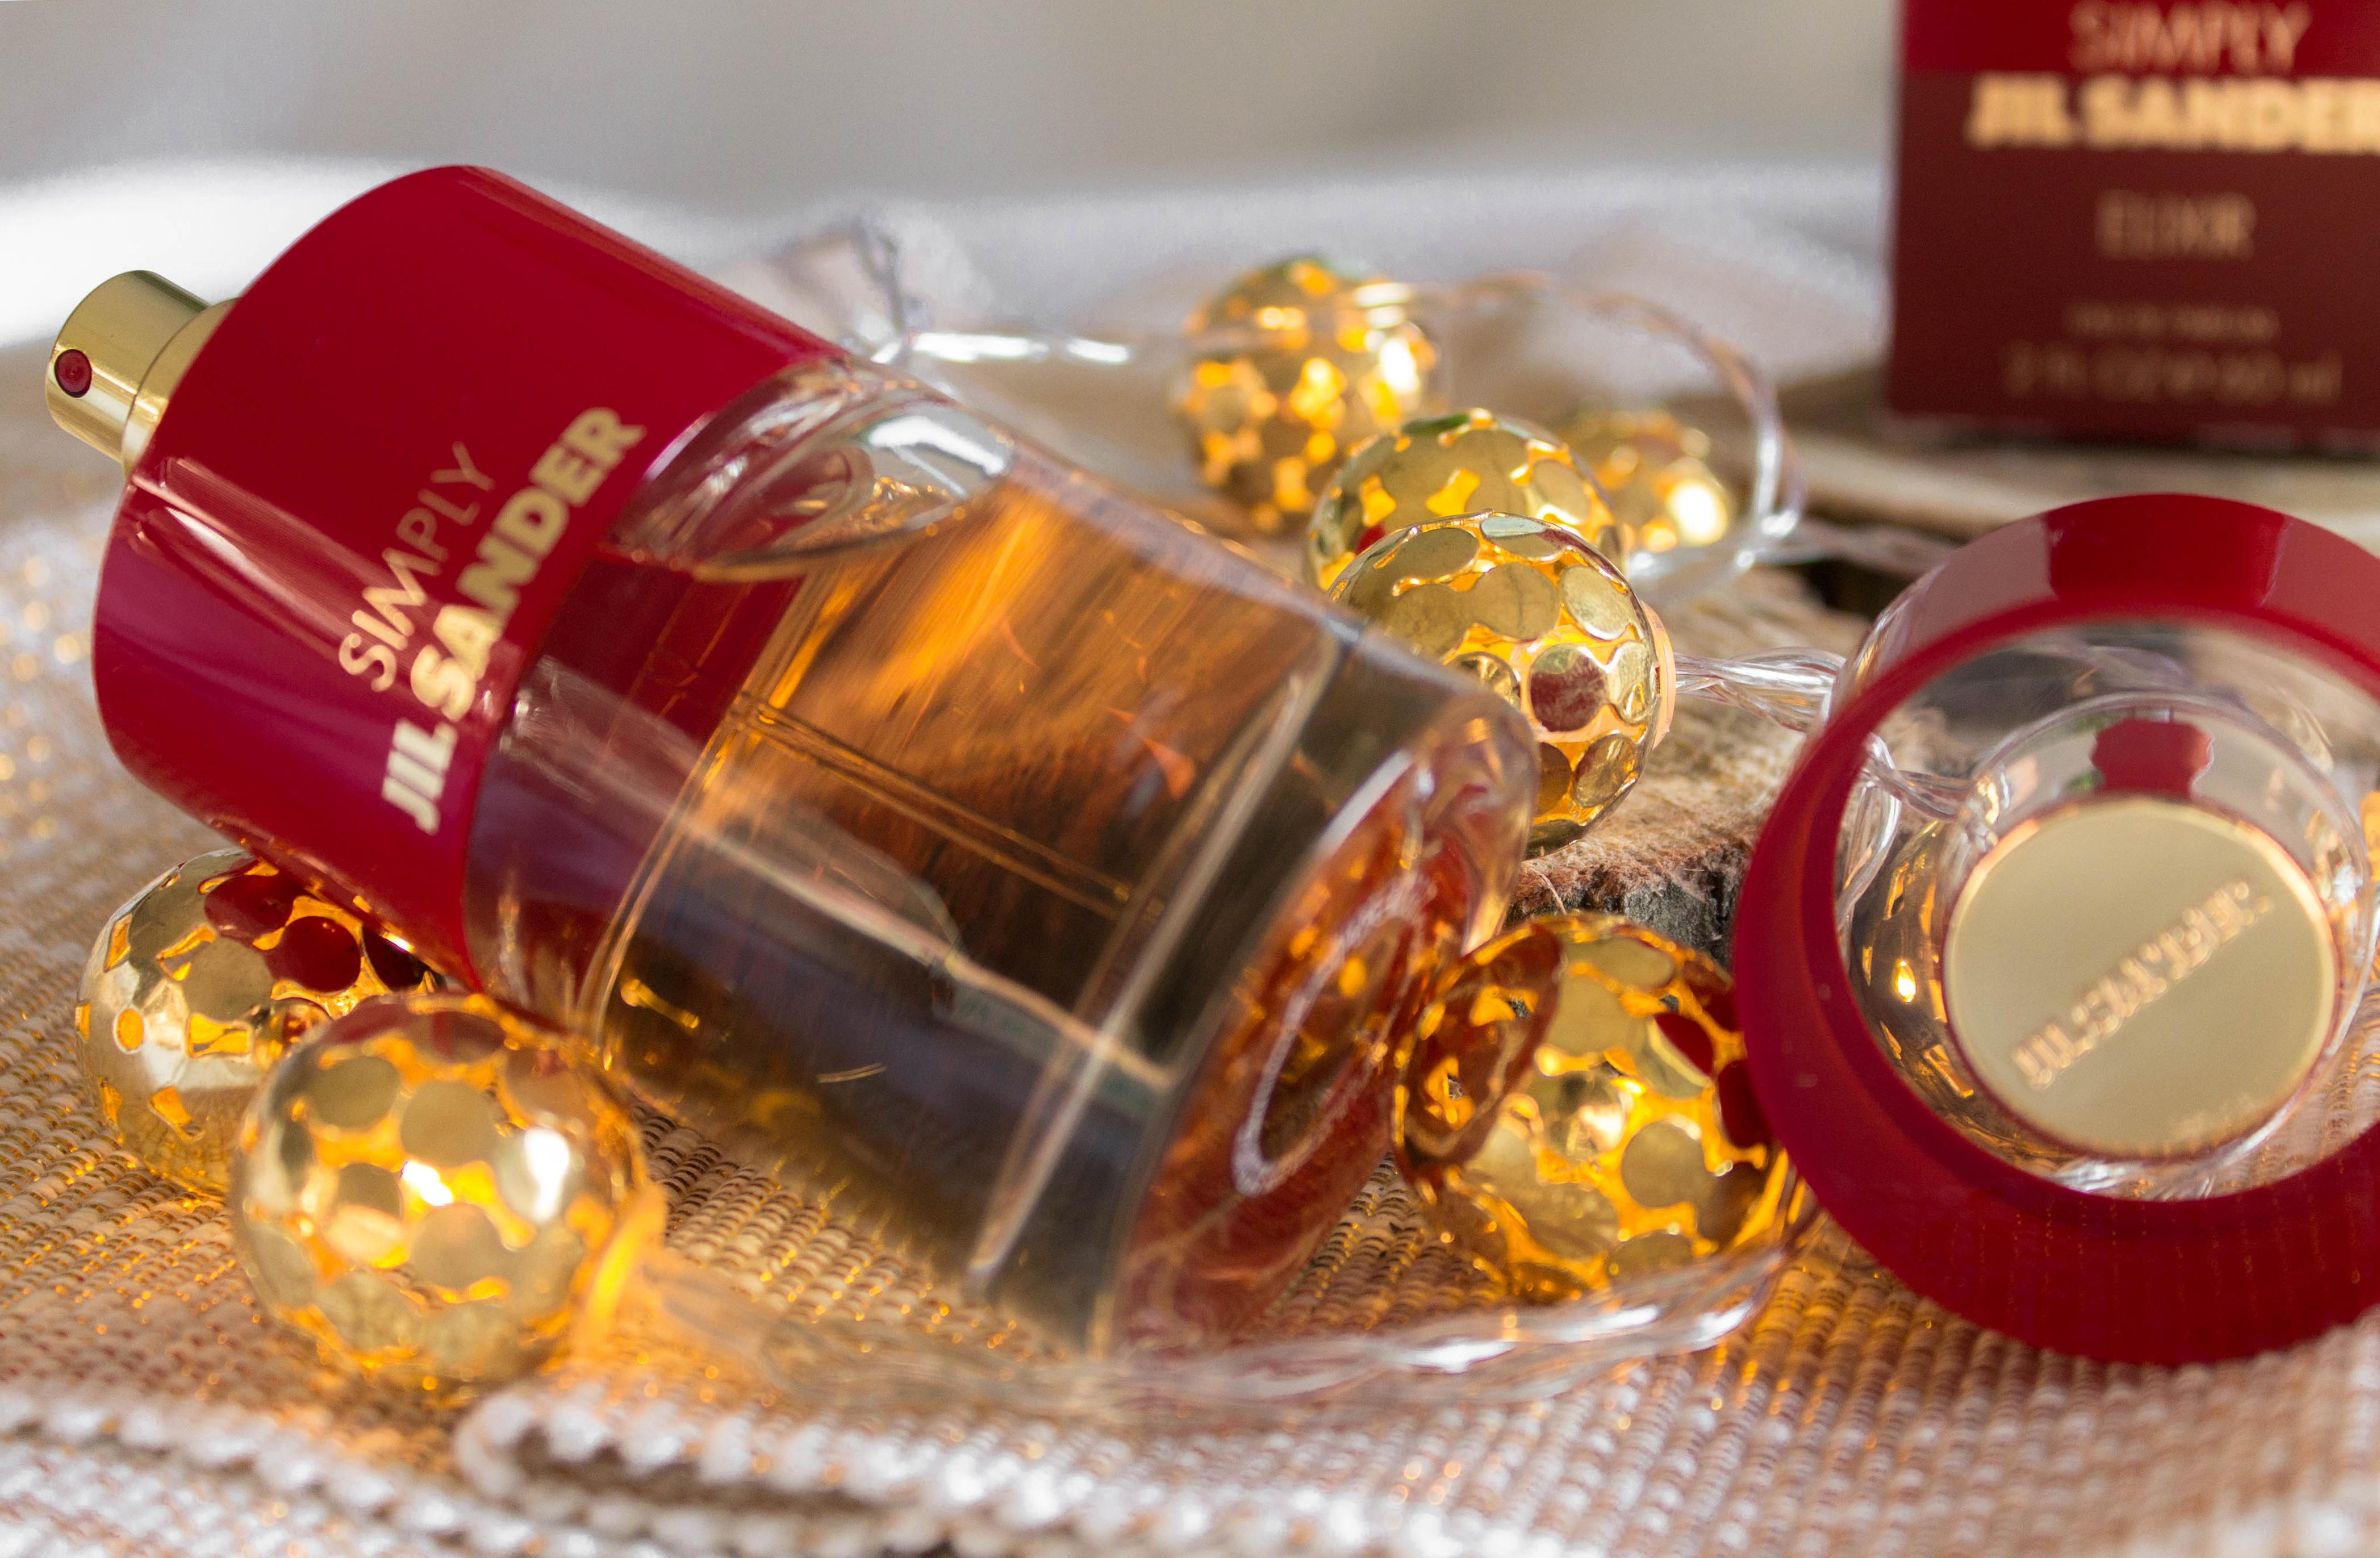 kardiaserena jil sander parfum simply gold red (2)